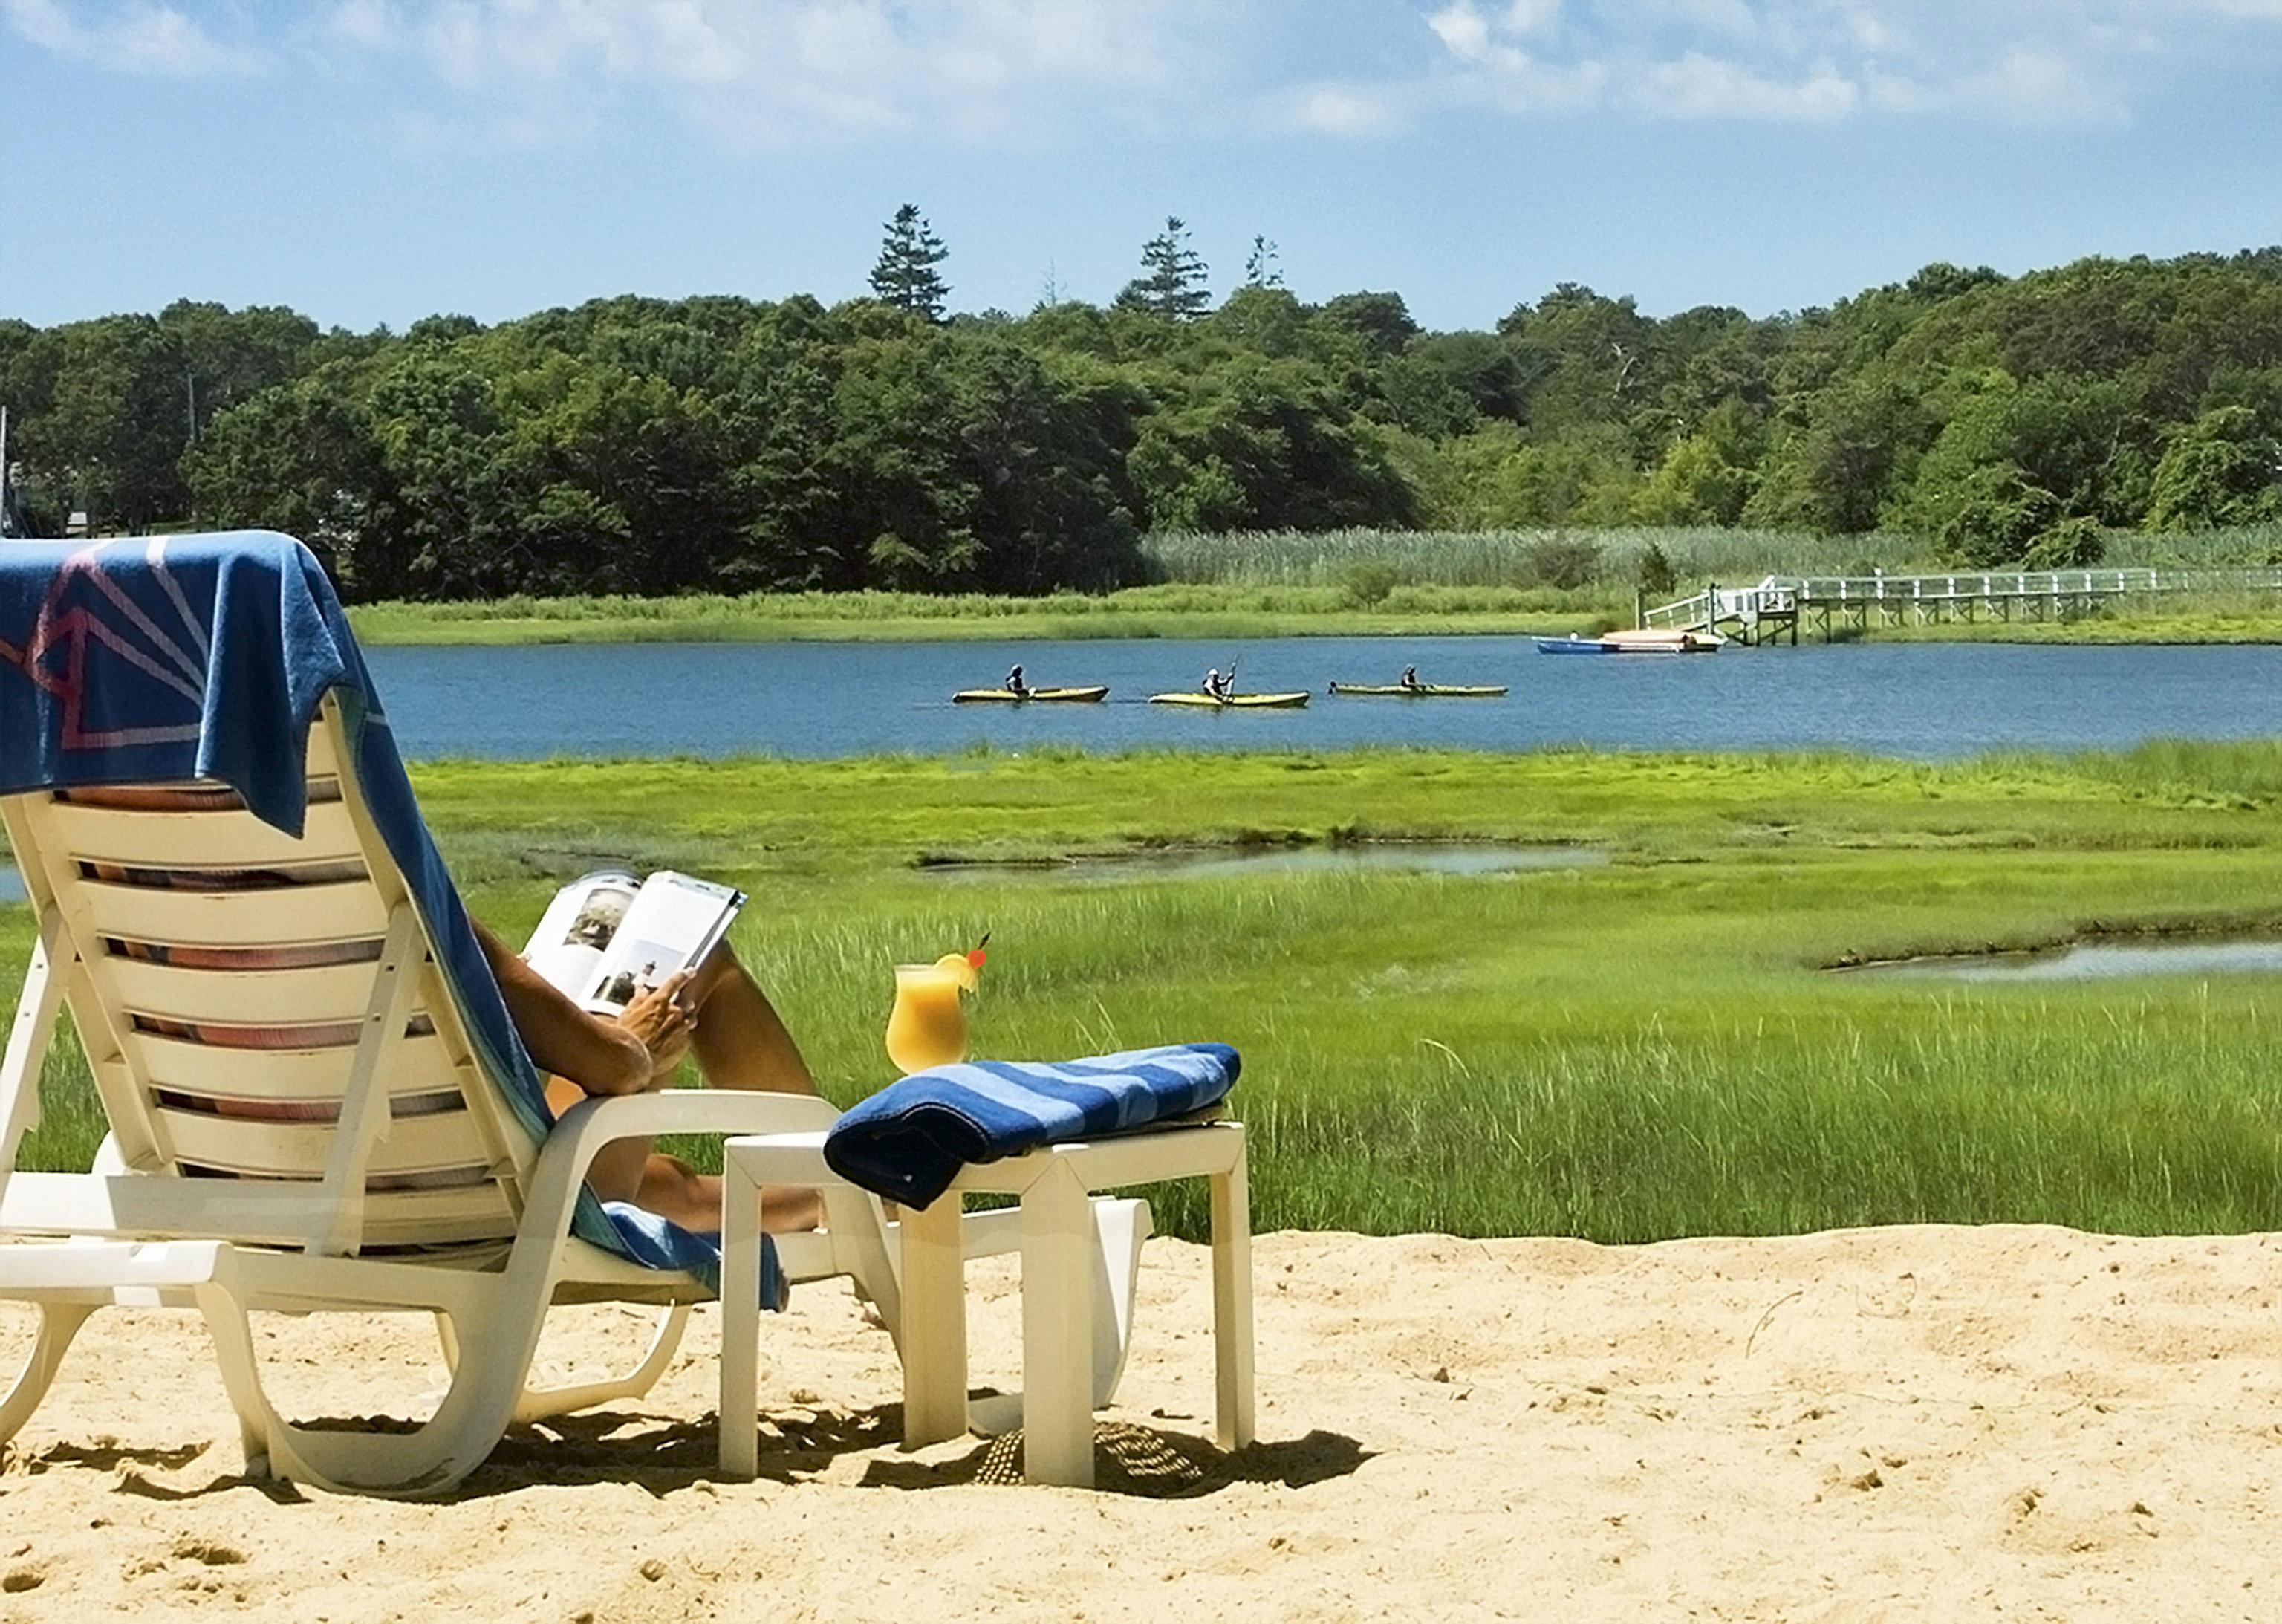 sky tree grass leisure Beach shore Sea chair seat day